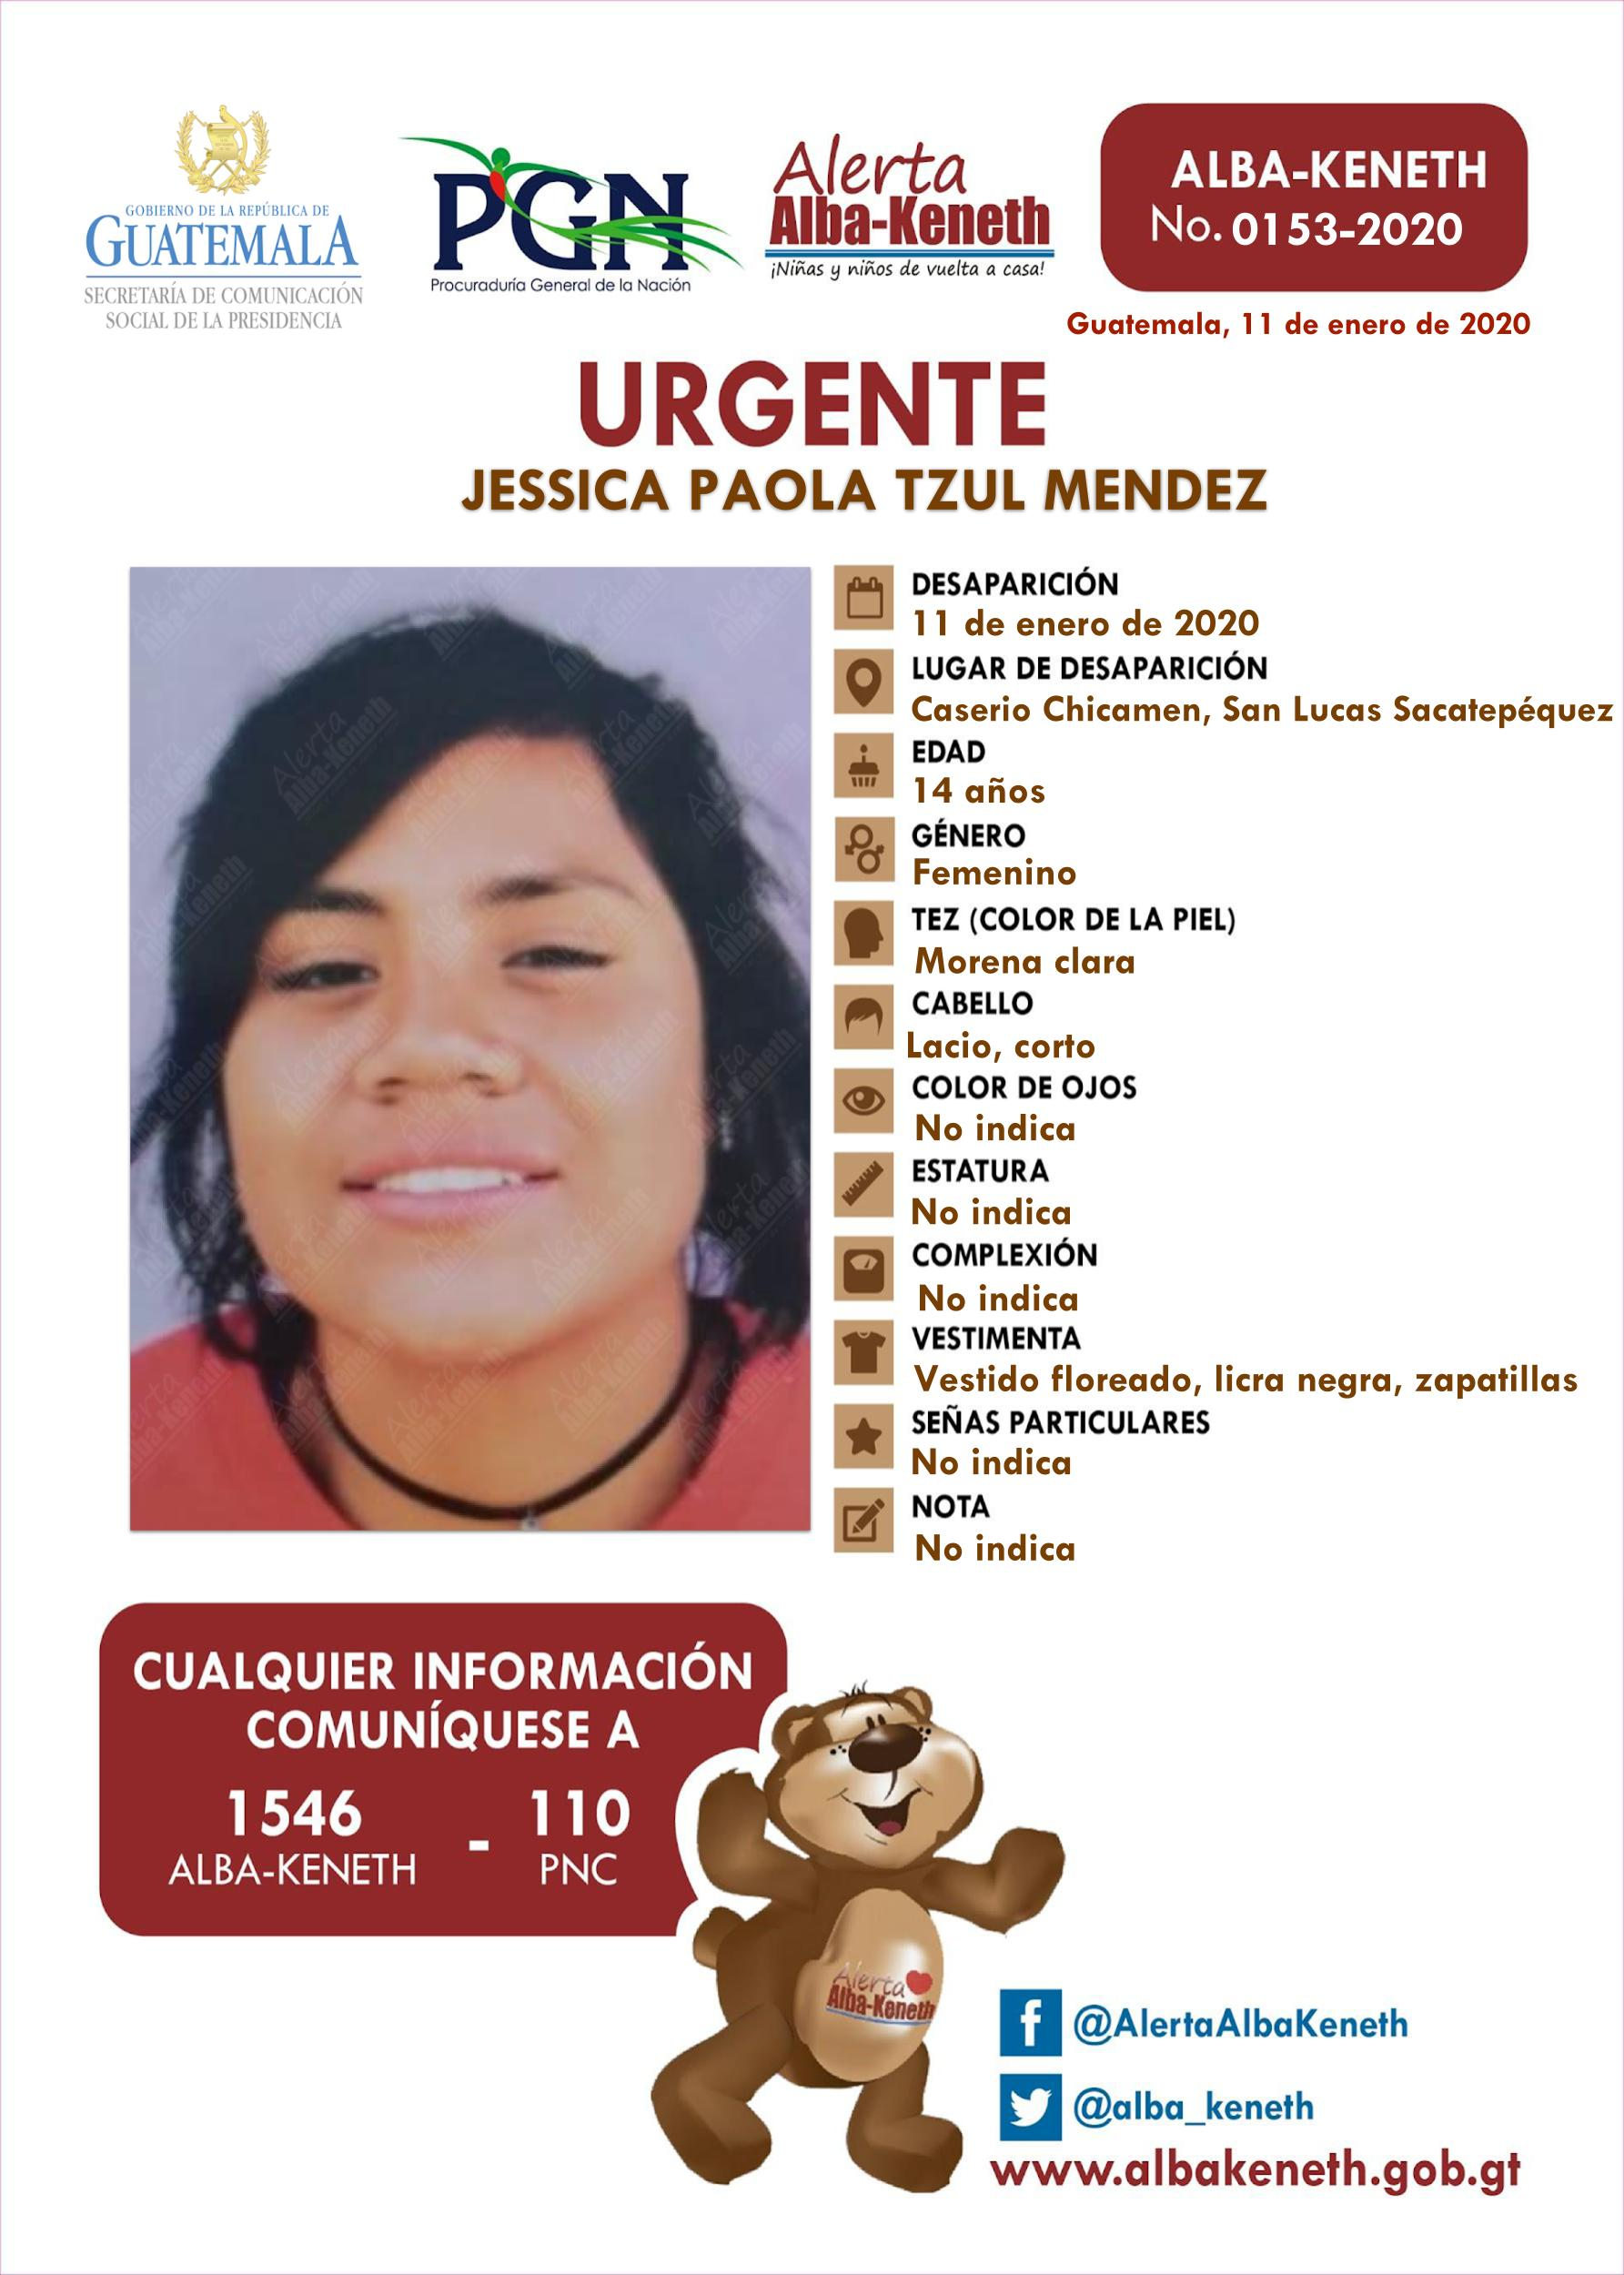 Jessica Paola Tzul Mendez